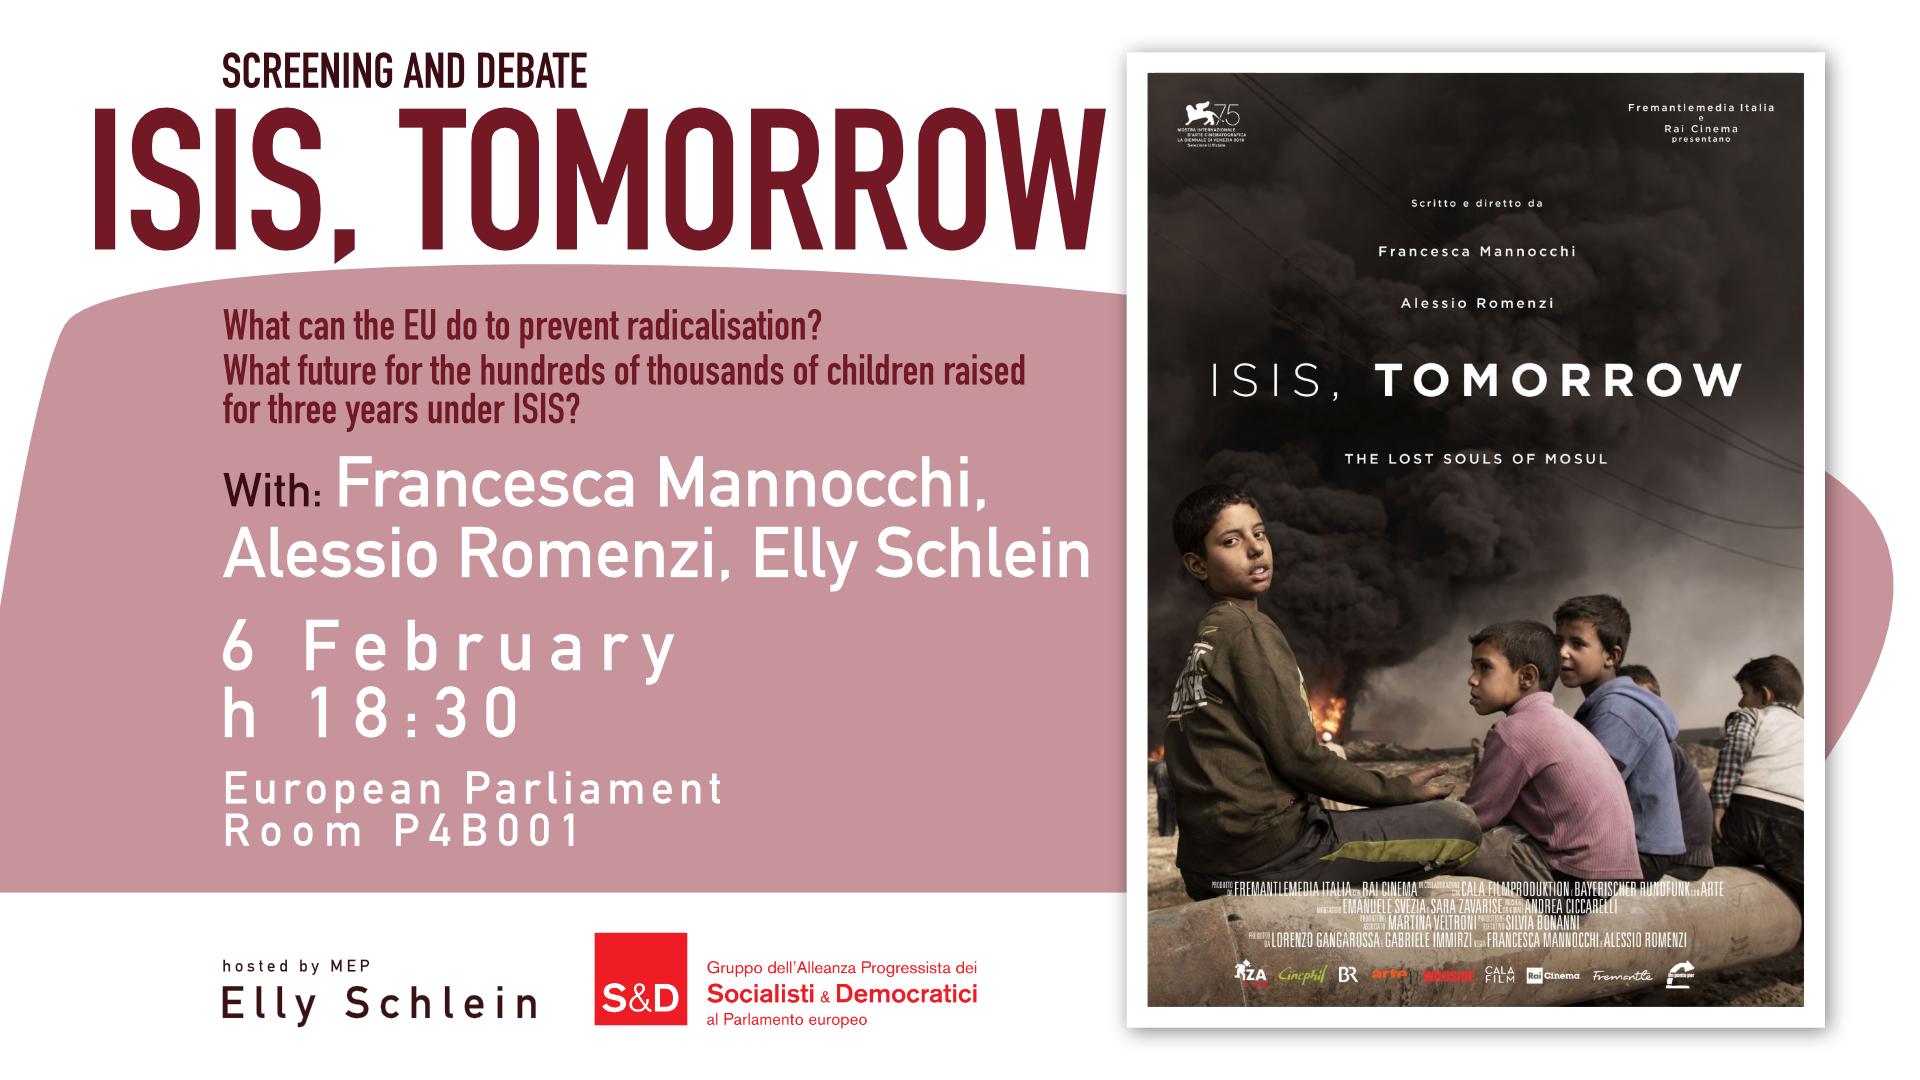 Isis, Tomorrow - Screening and Debate